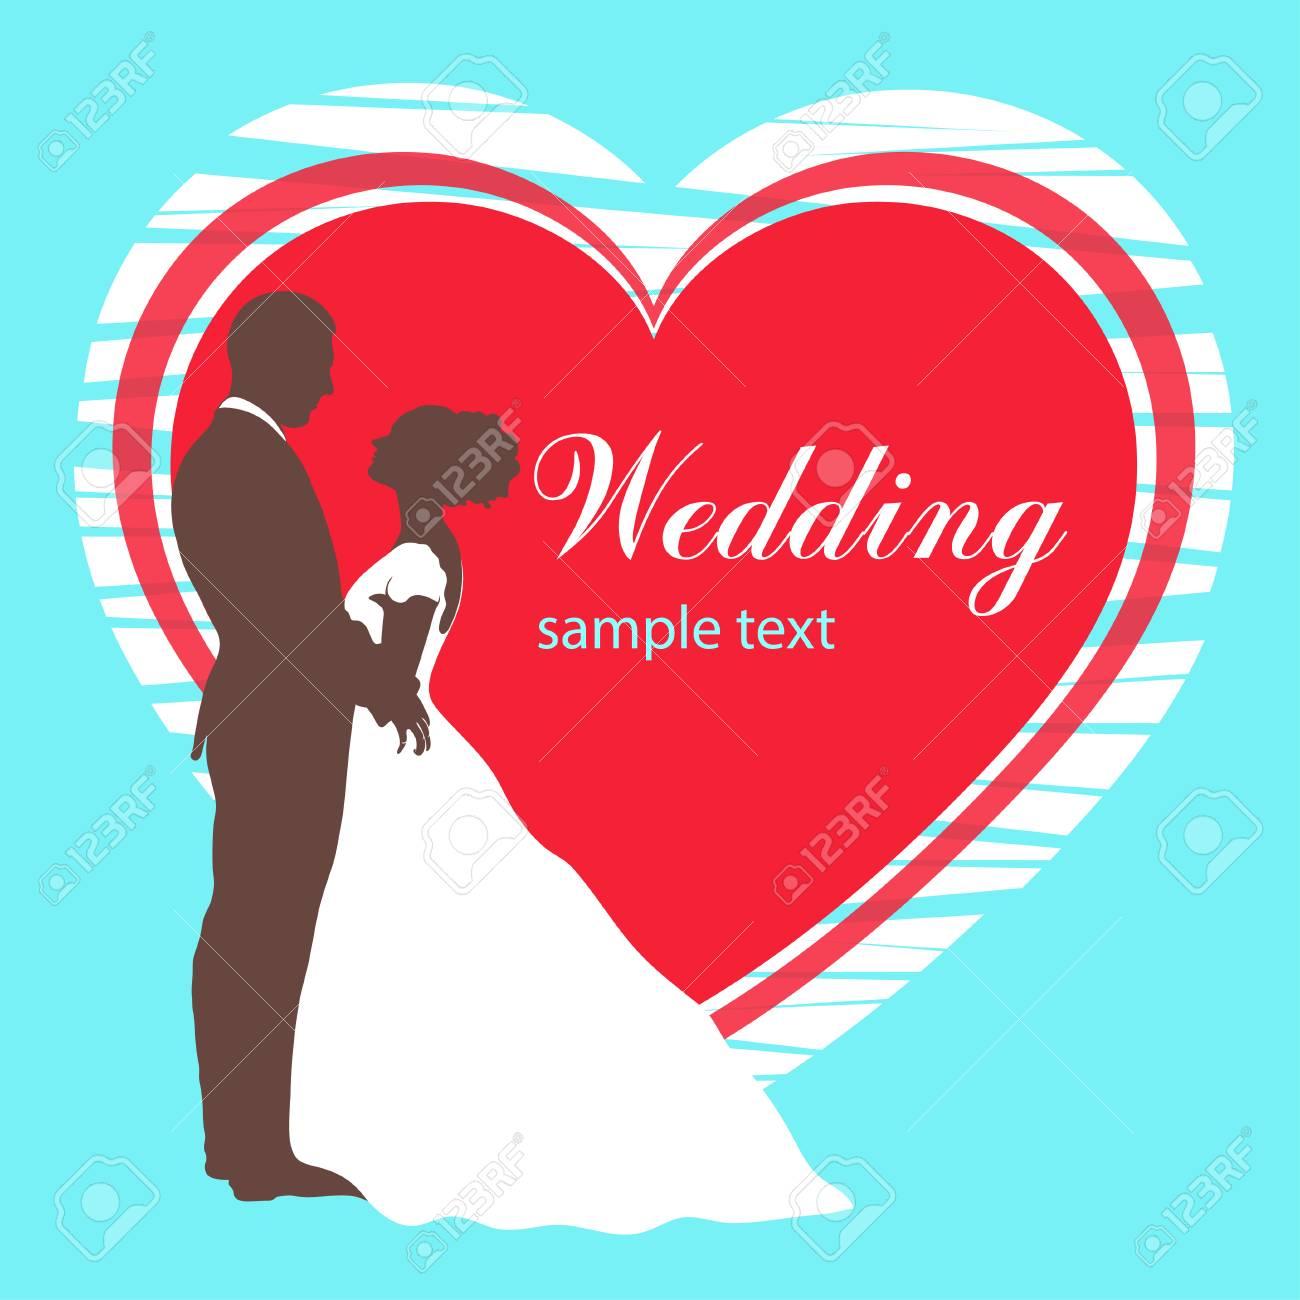 Bride And Groom Silhouette, Wedding Invitation, Card, Vector ...